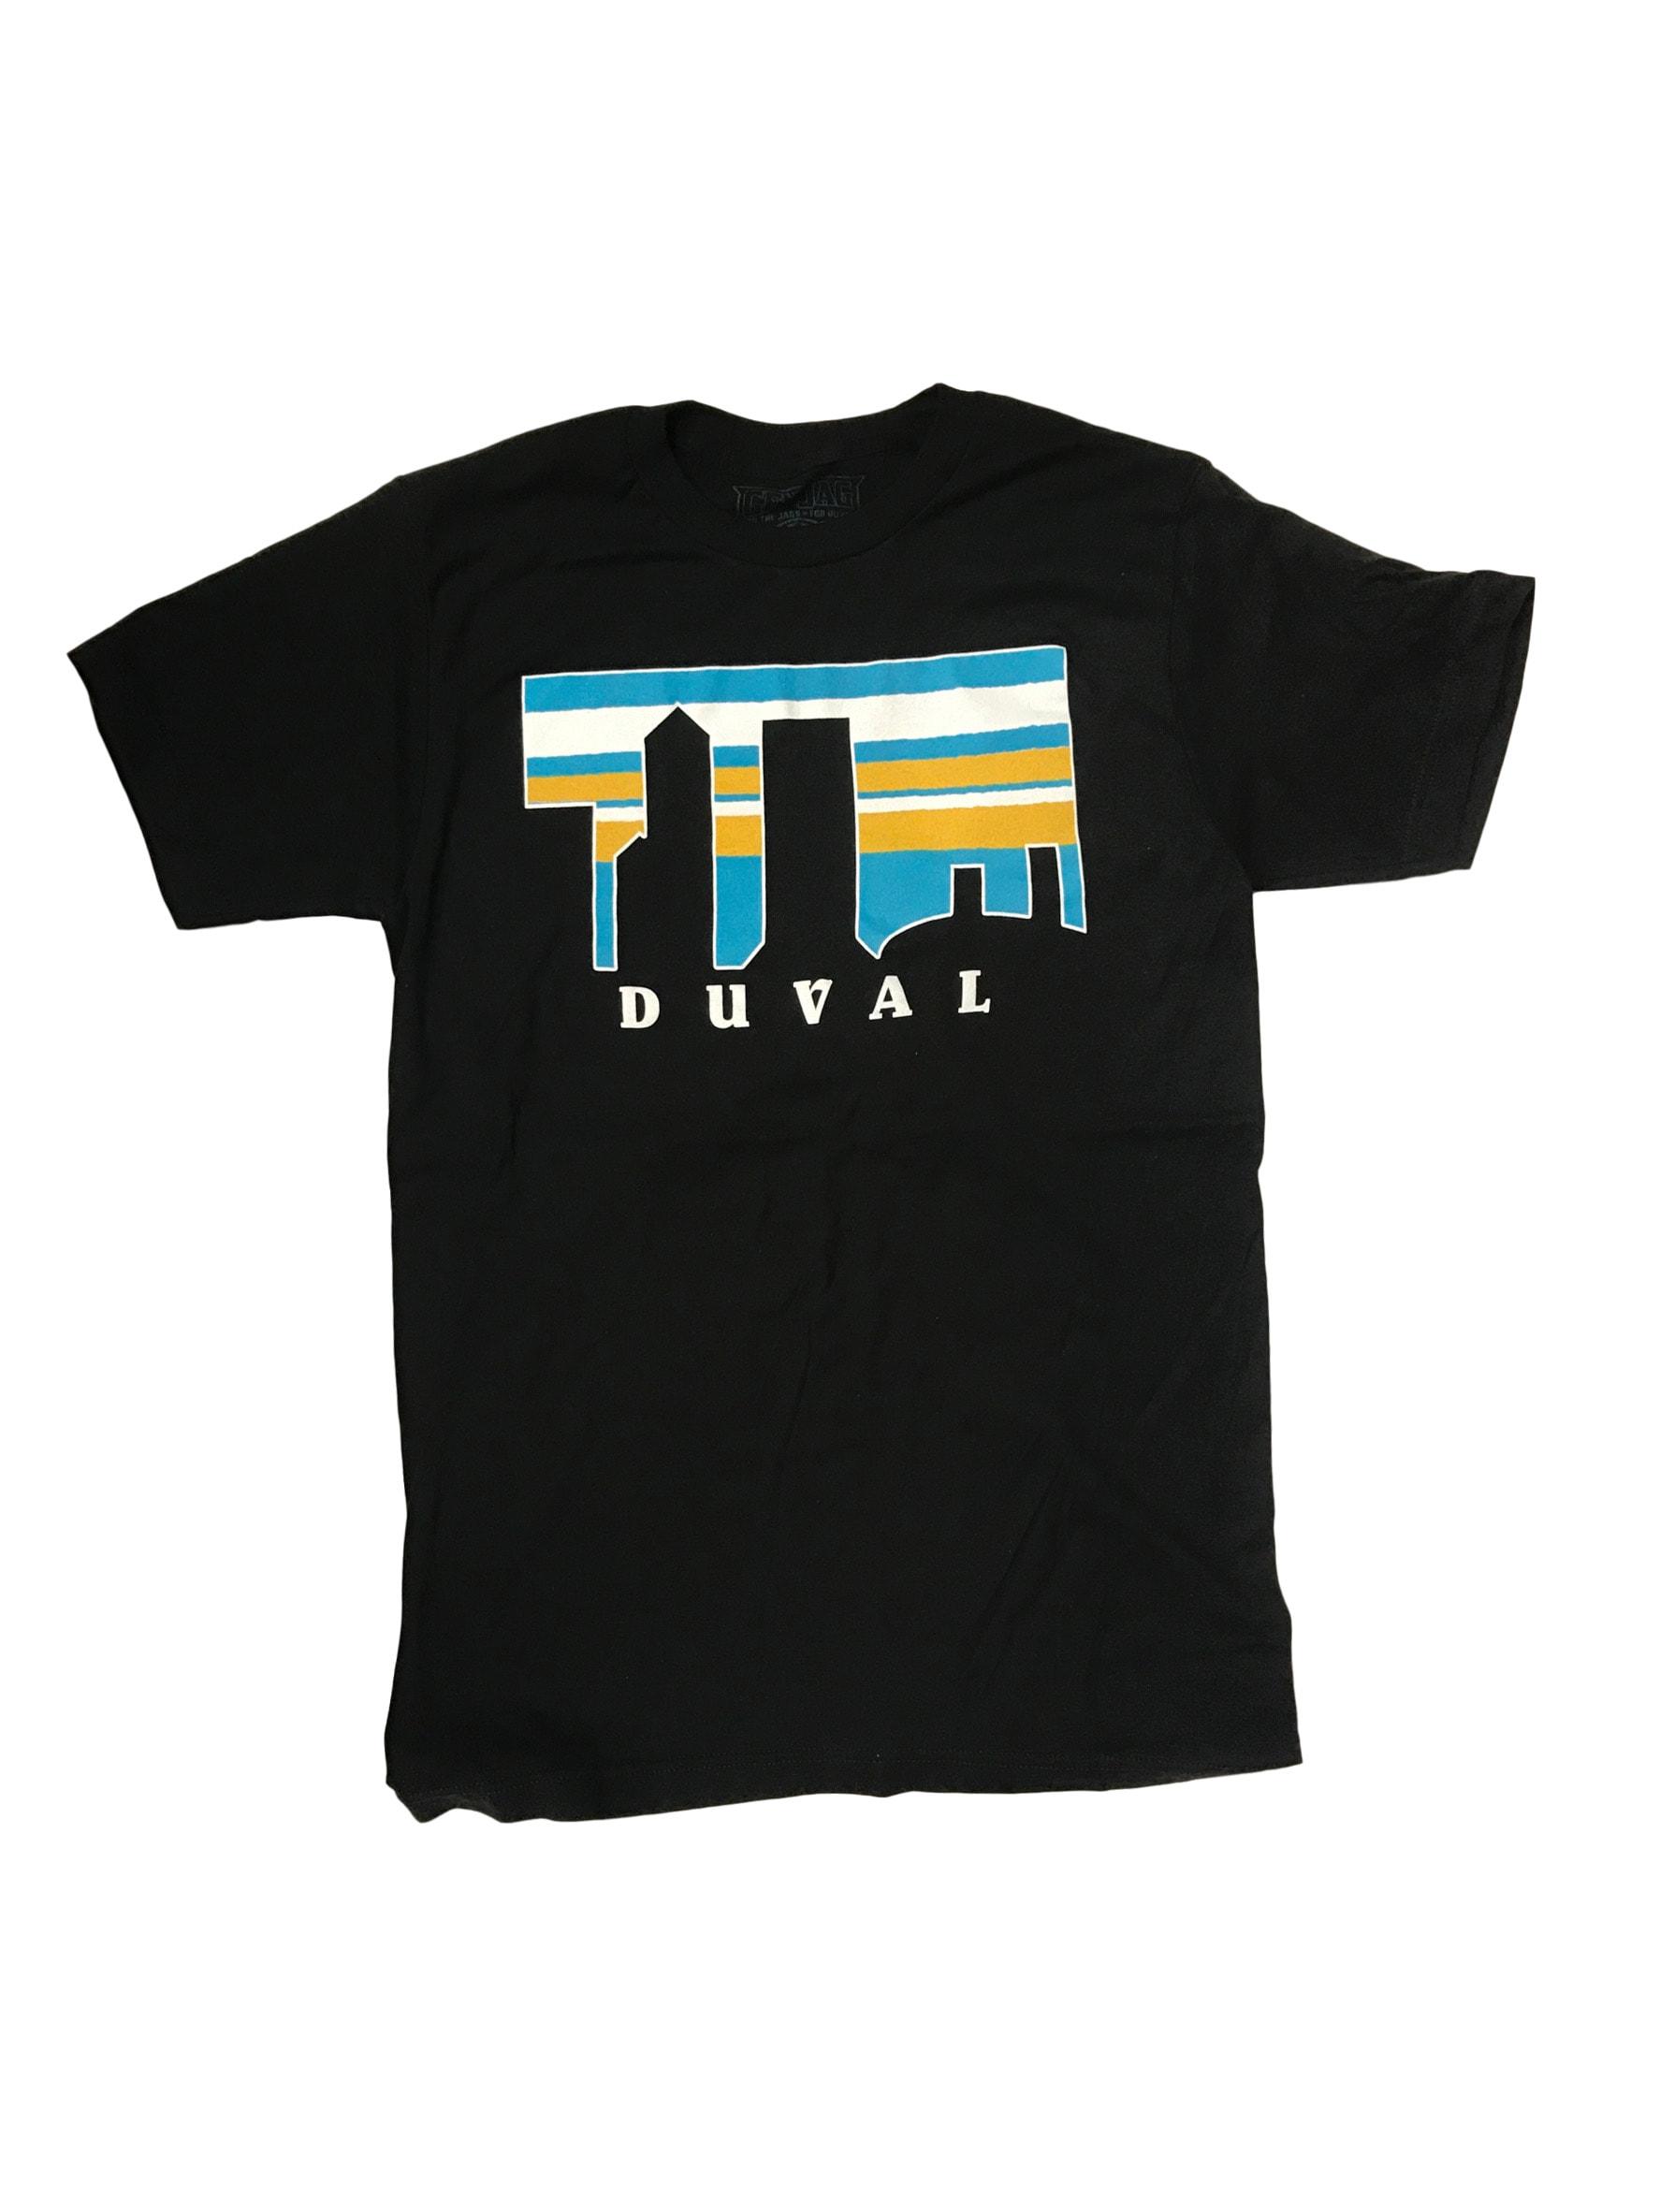 best service 9e992 1ccb8 Duval Skyline T-Shirt